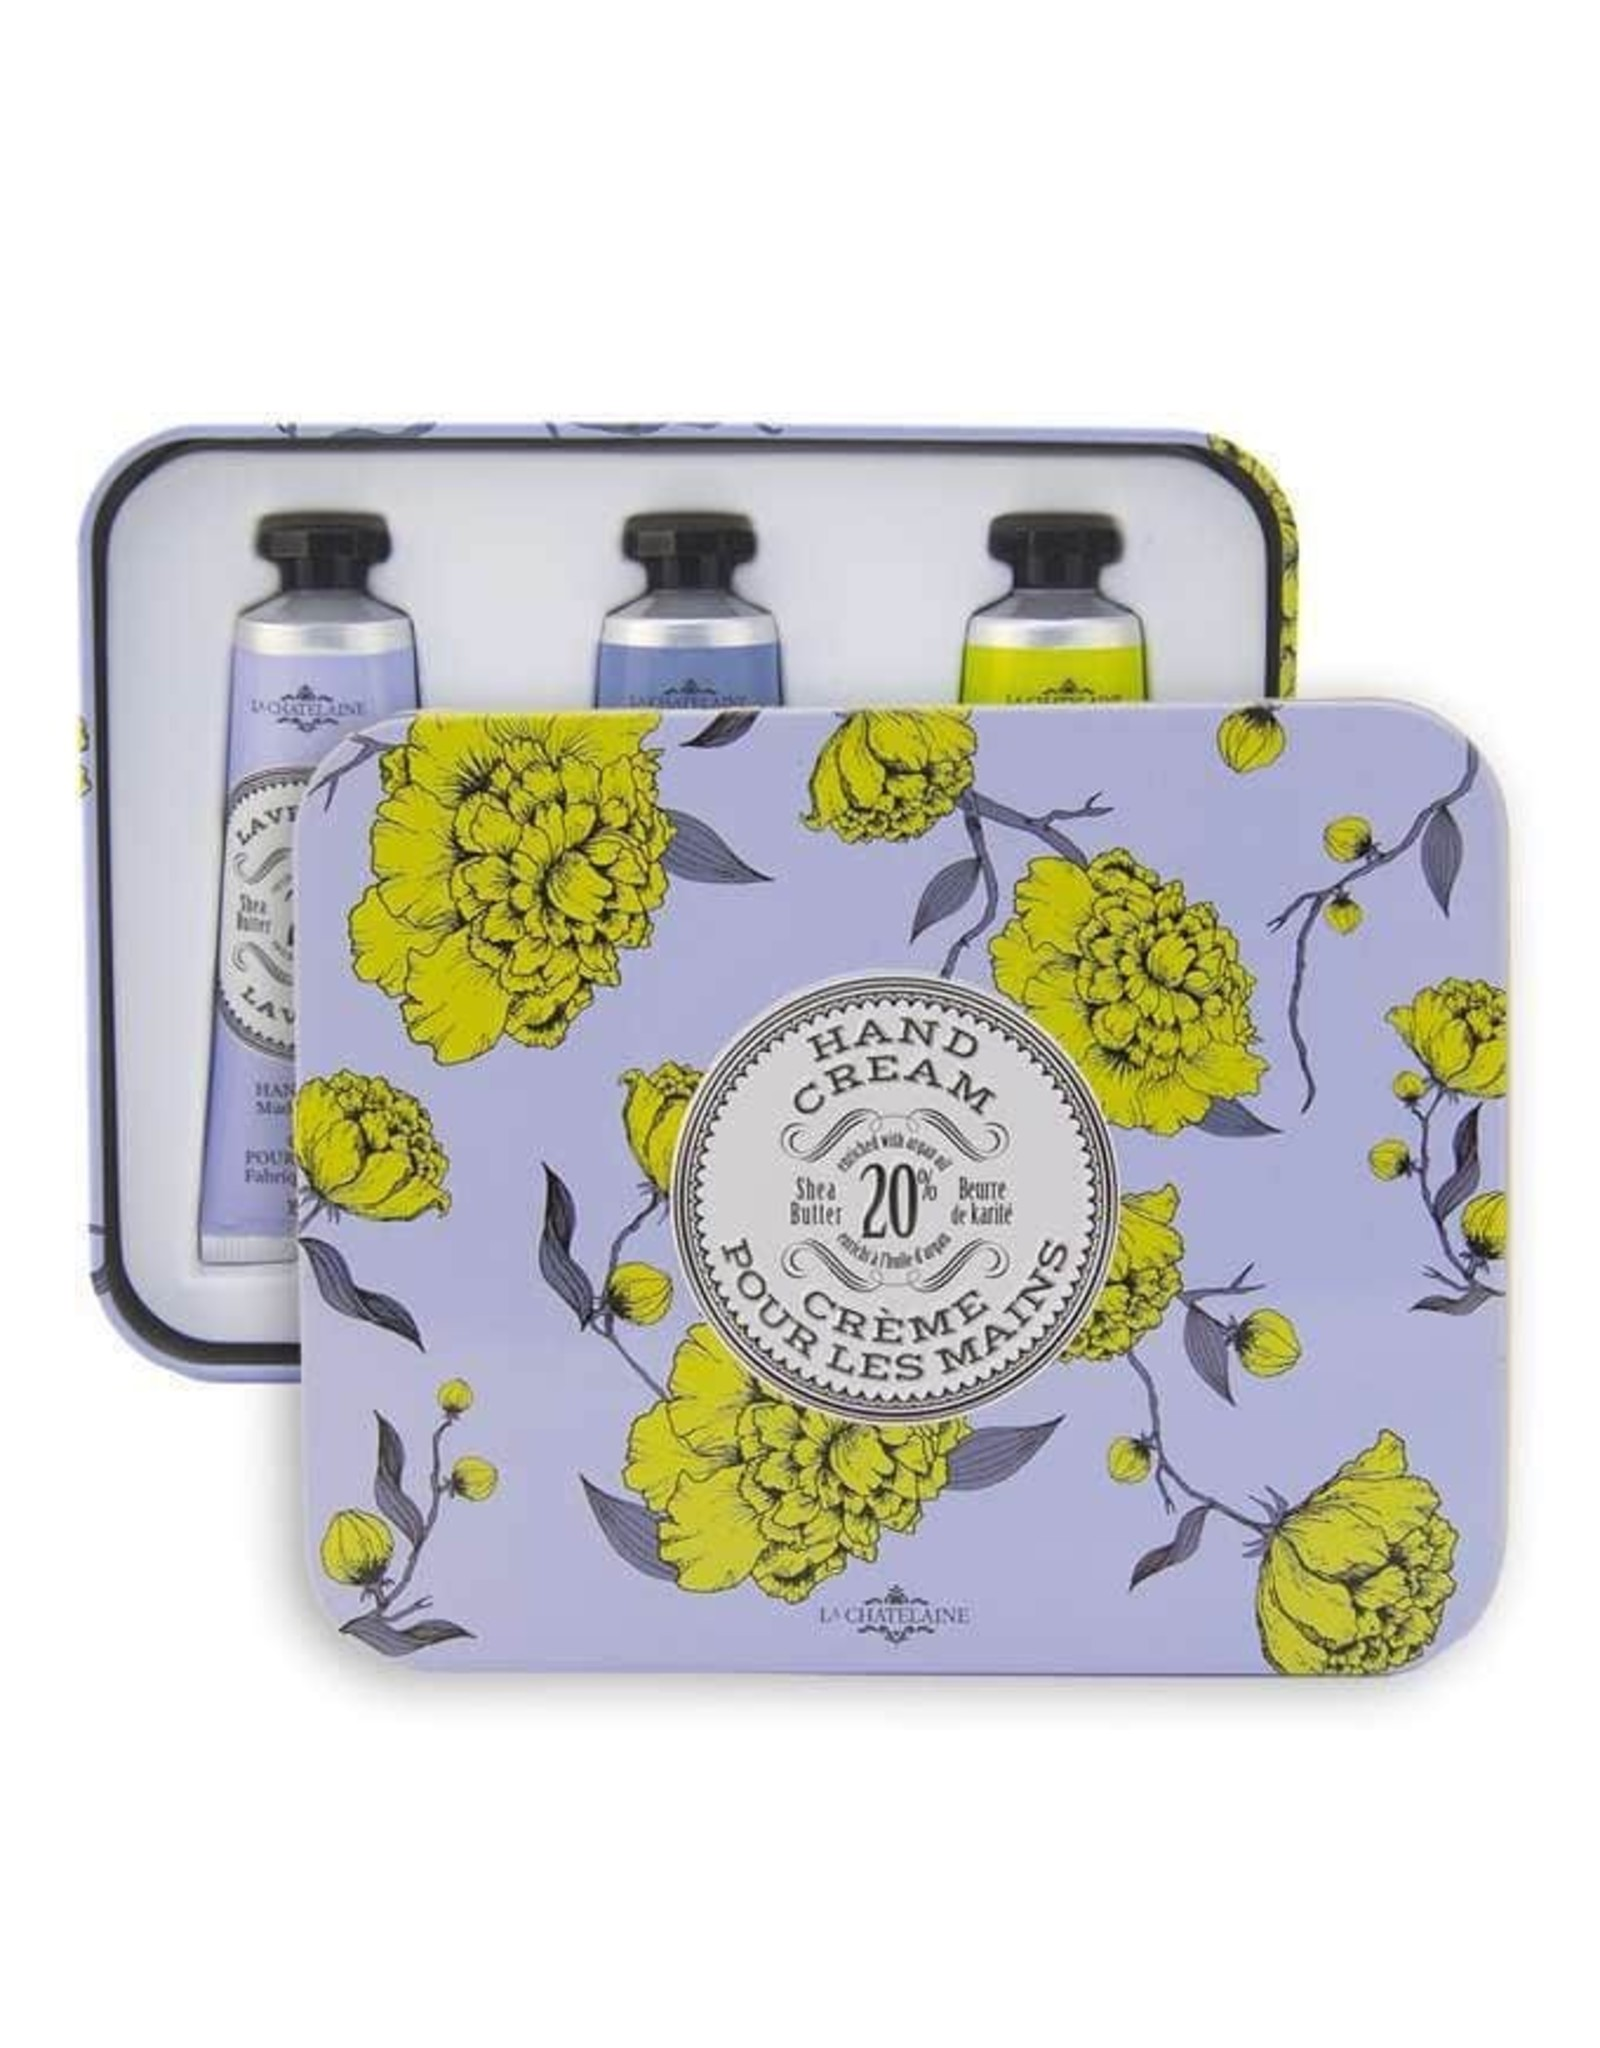 La Chatelaine Lavender Hand Cream Trio Tin